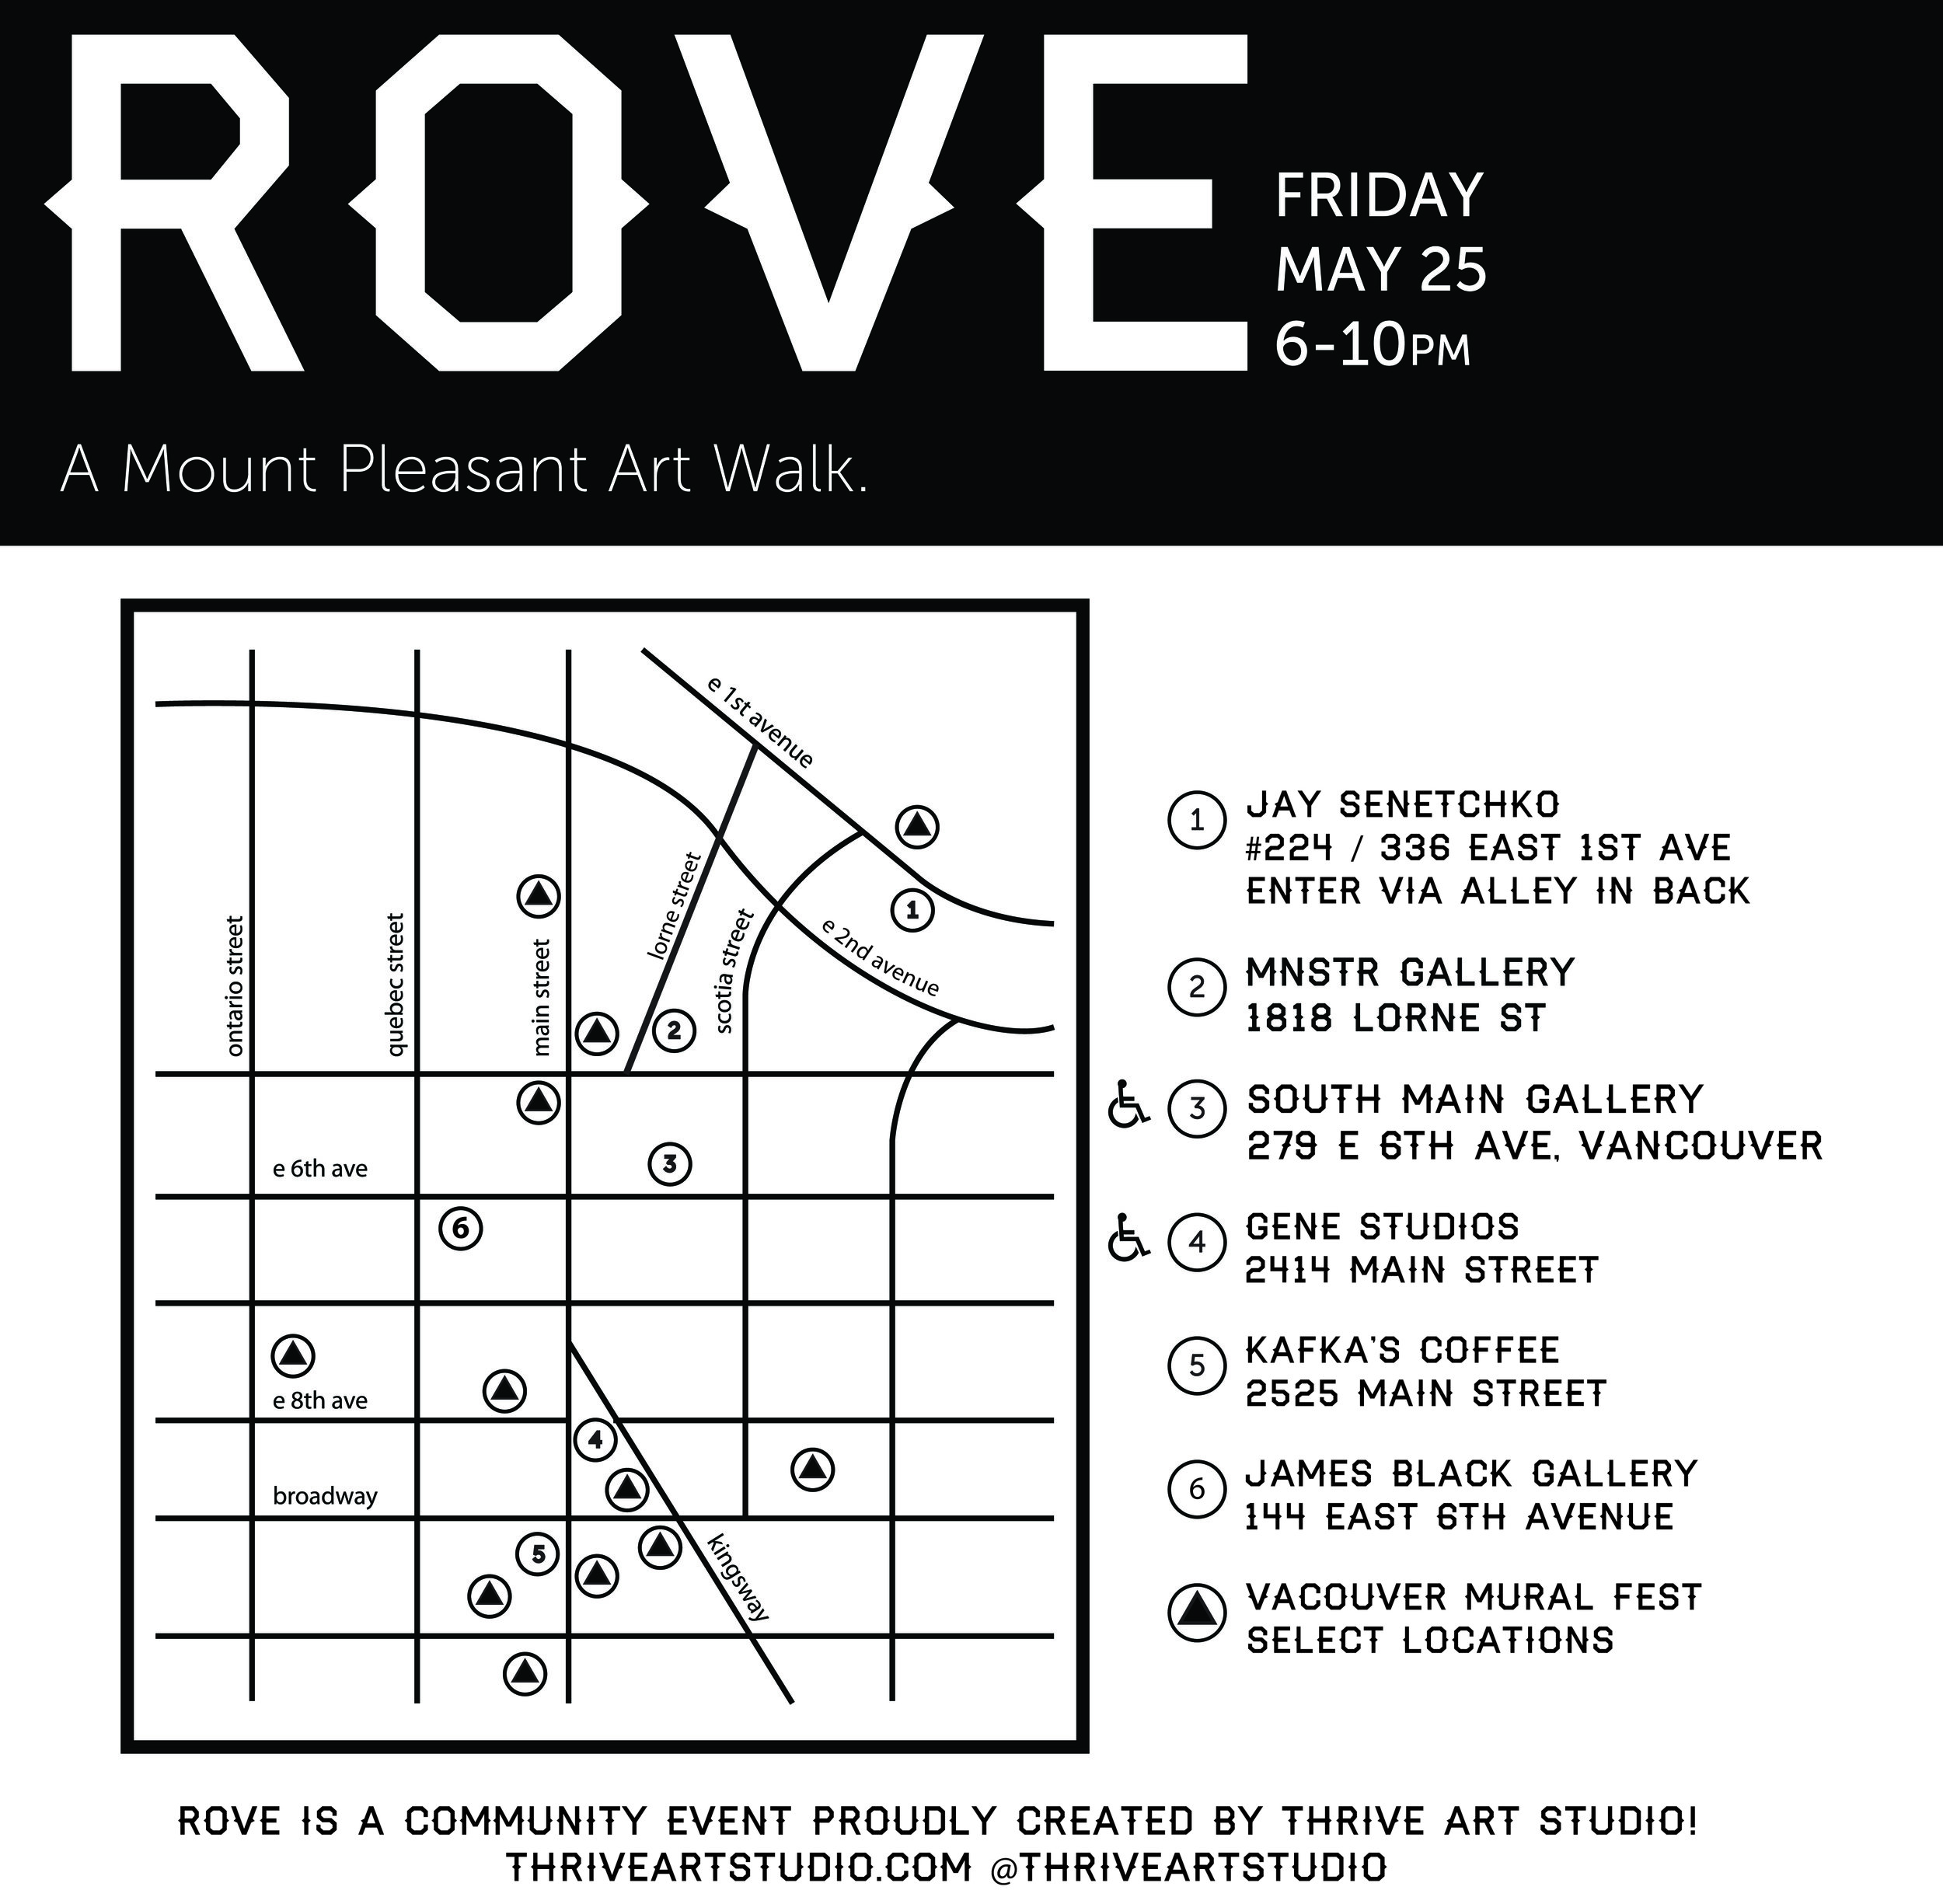 ROVE Map 2018.jpg